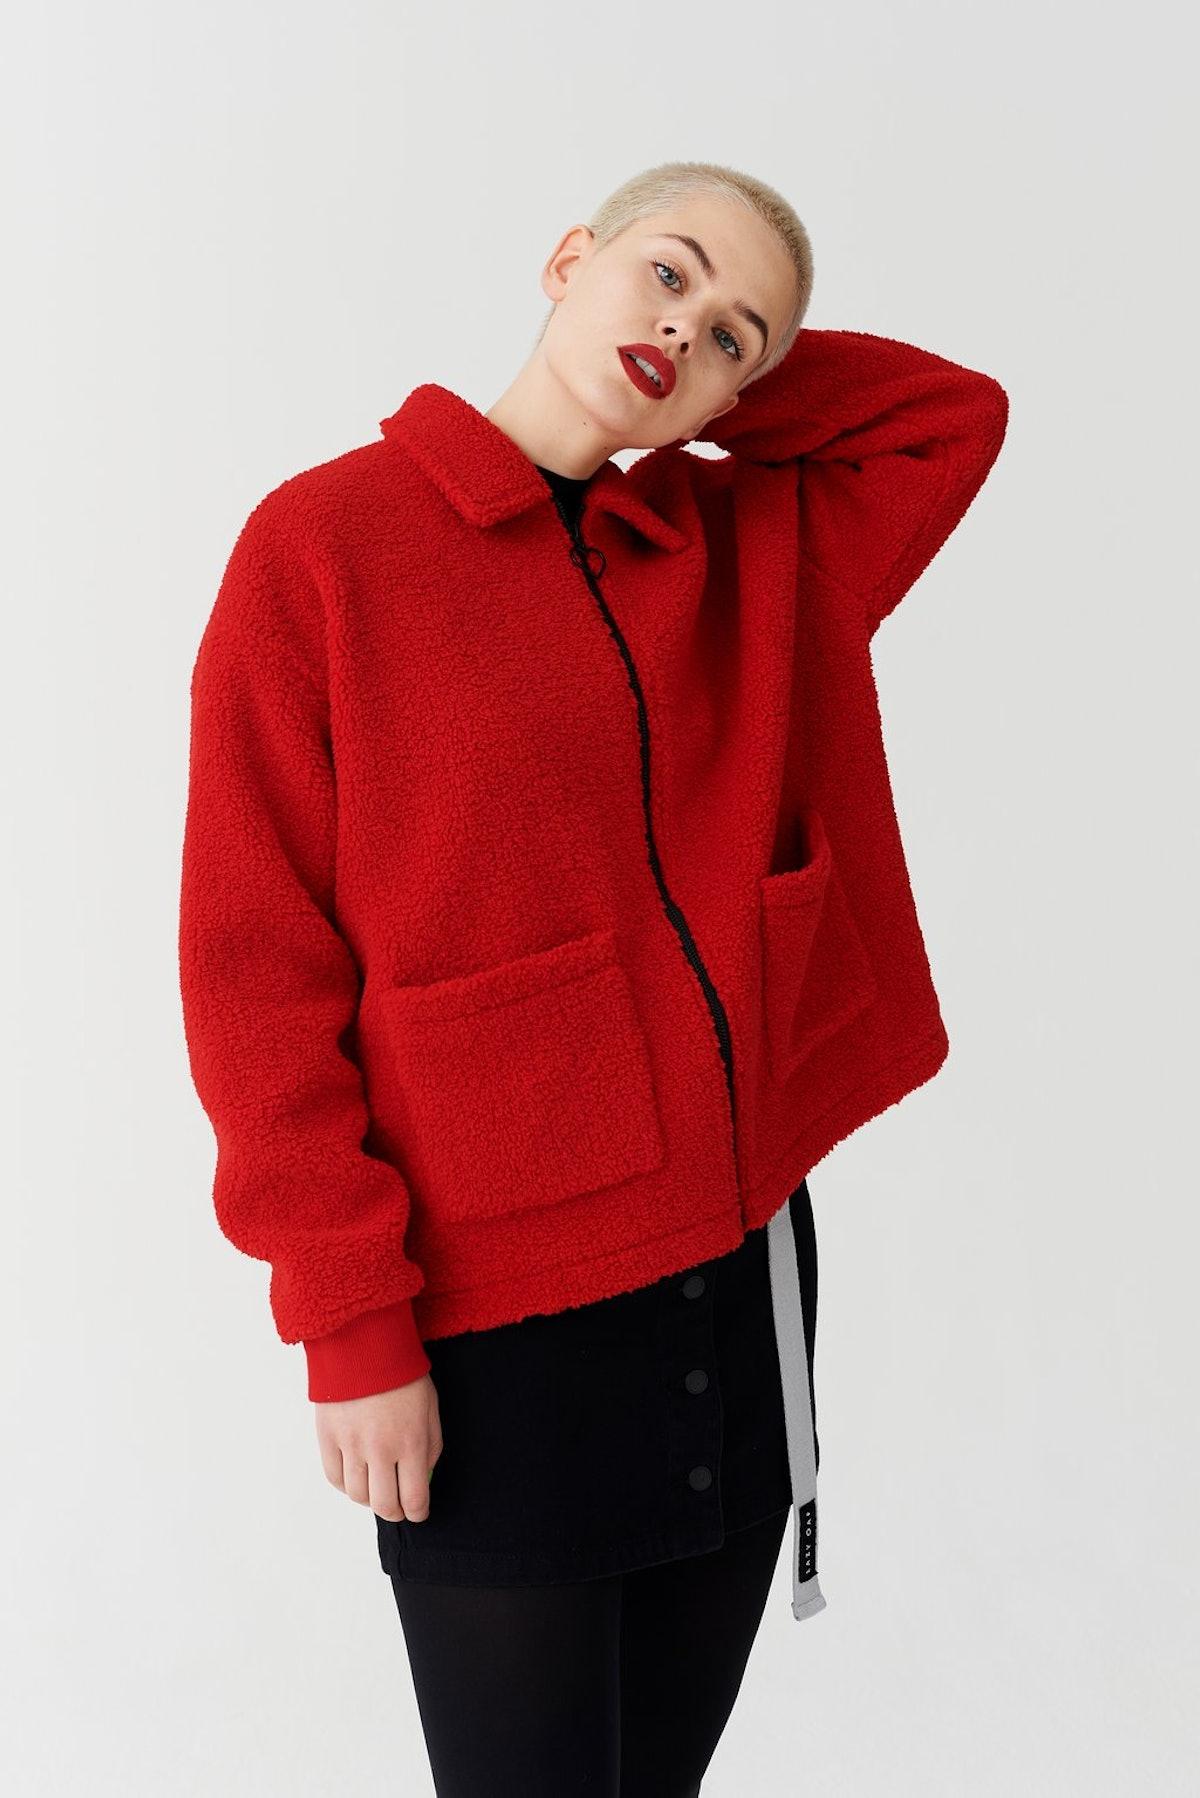 Lazy Oaf Always Watching Zip Fleece Jacket